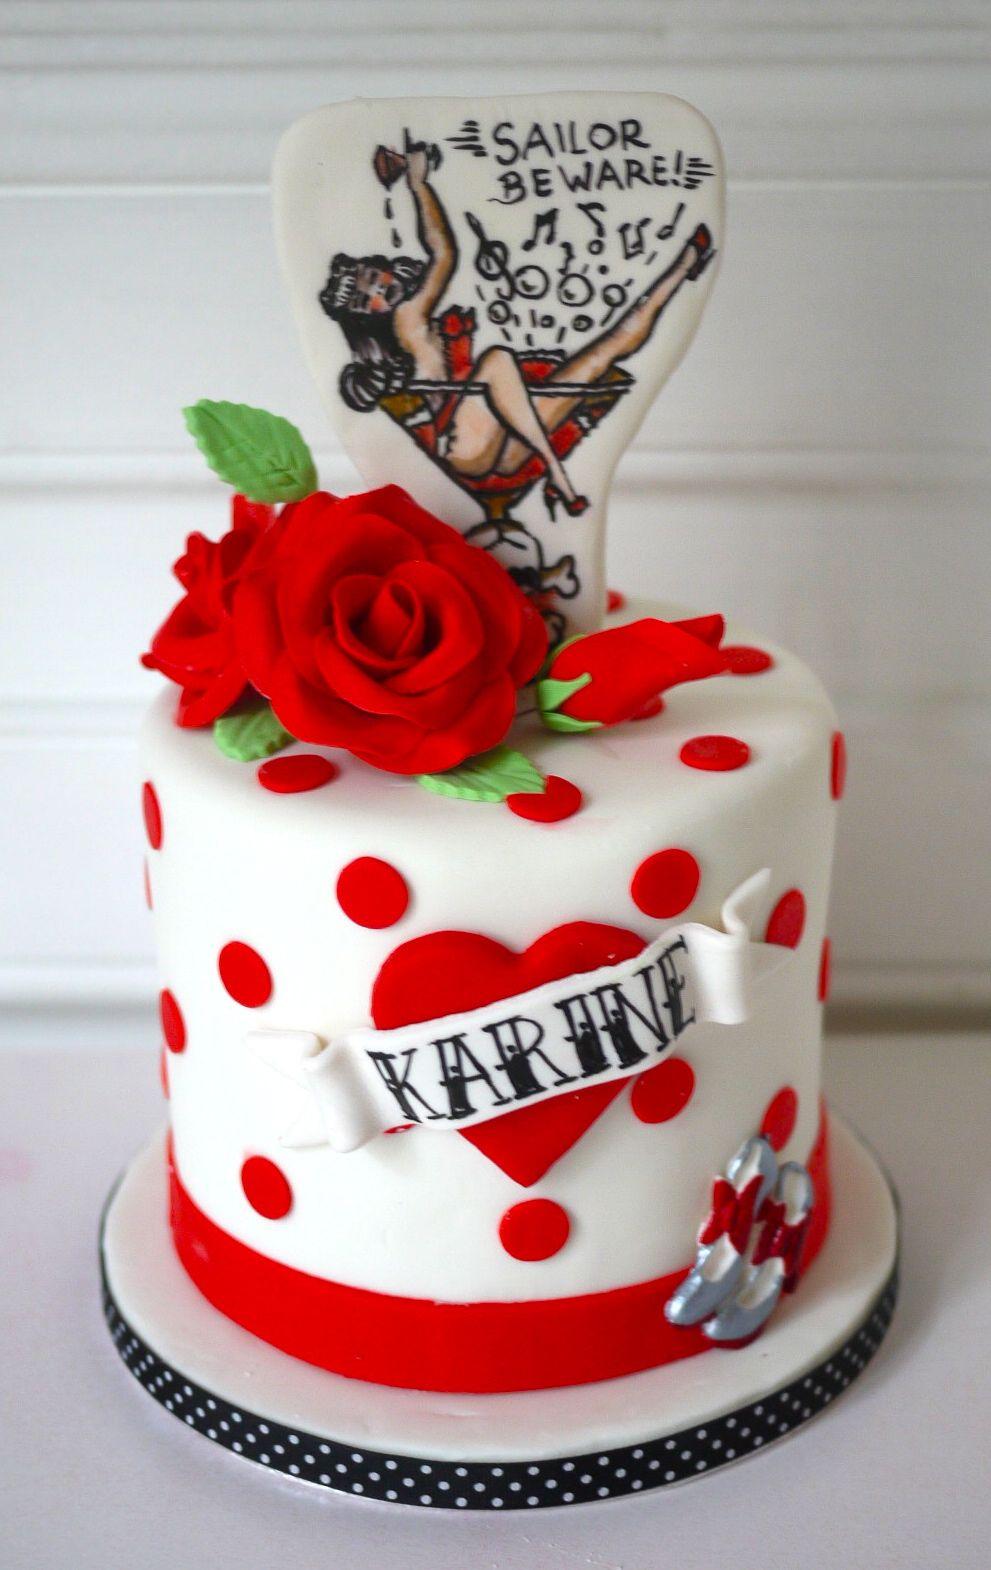 retro pin up cake wedding ideas pinterest cake school and